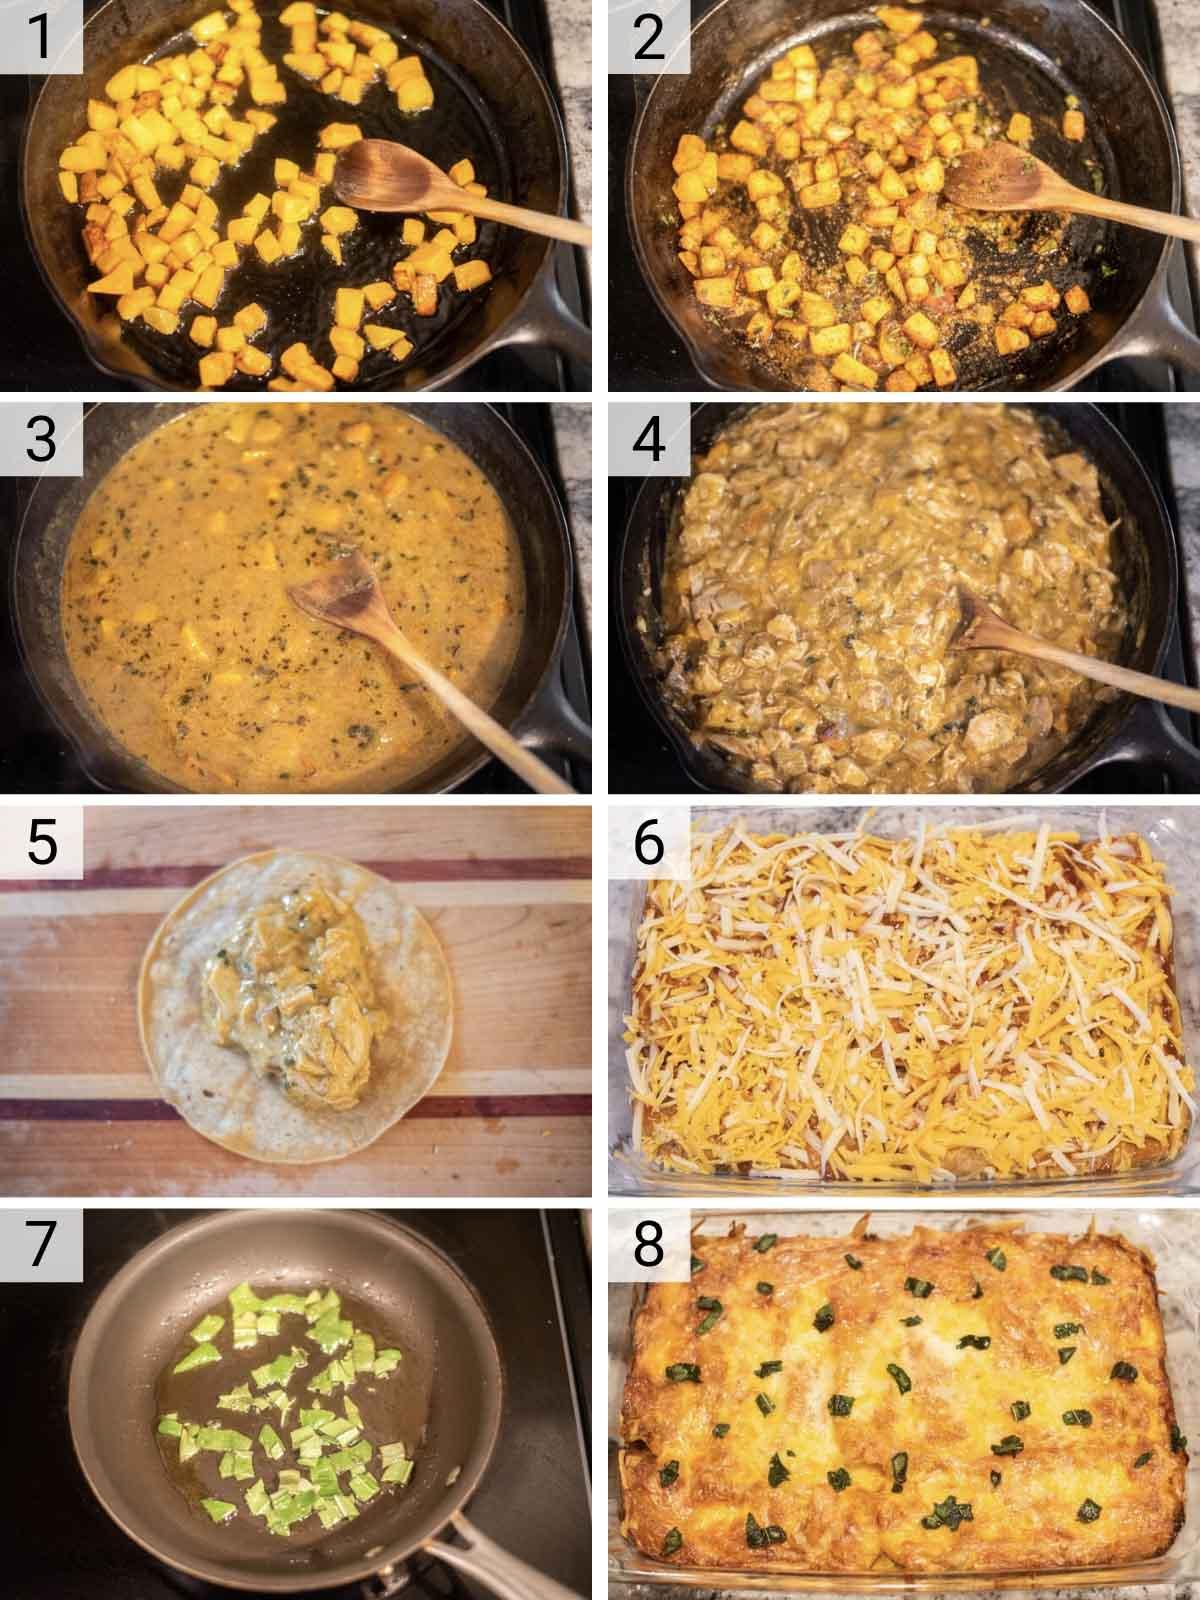 process shots of how to make turkey enchiladas